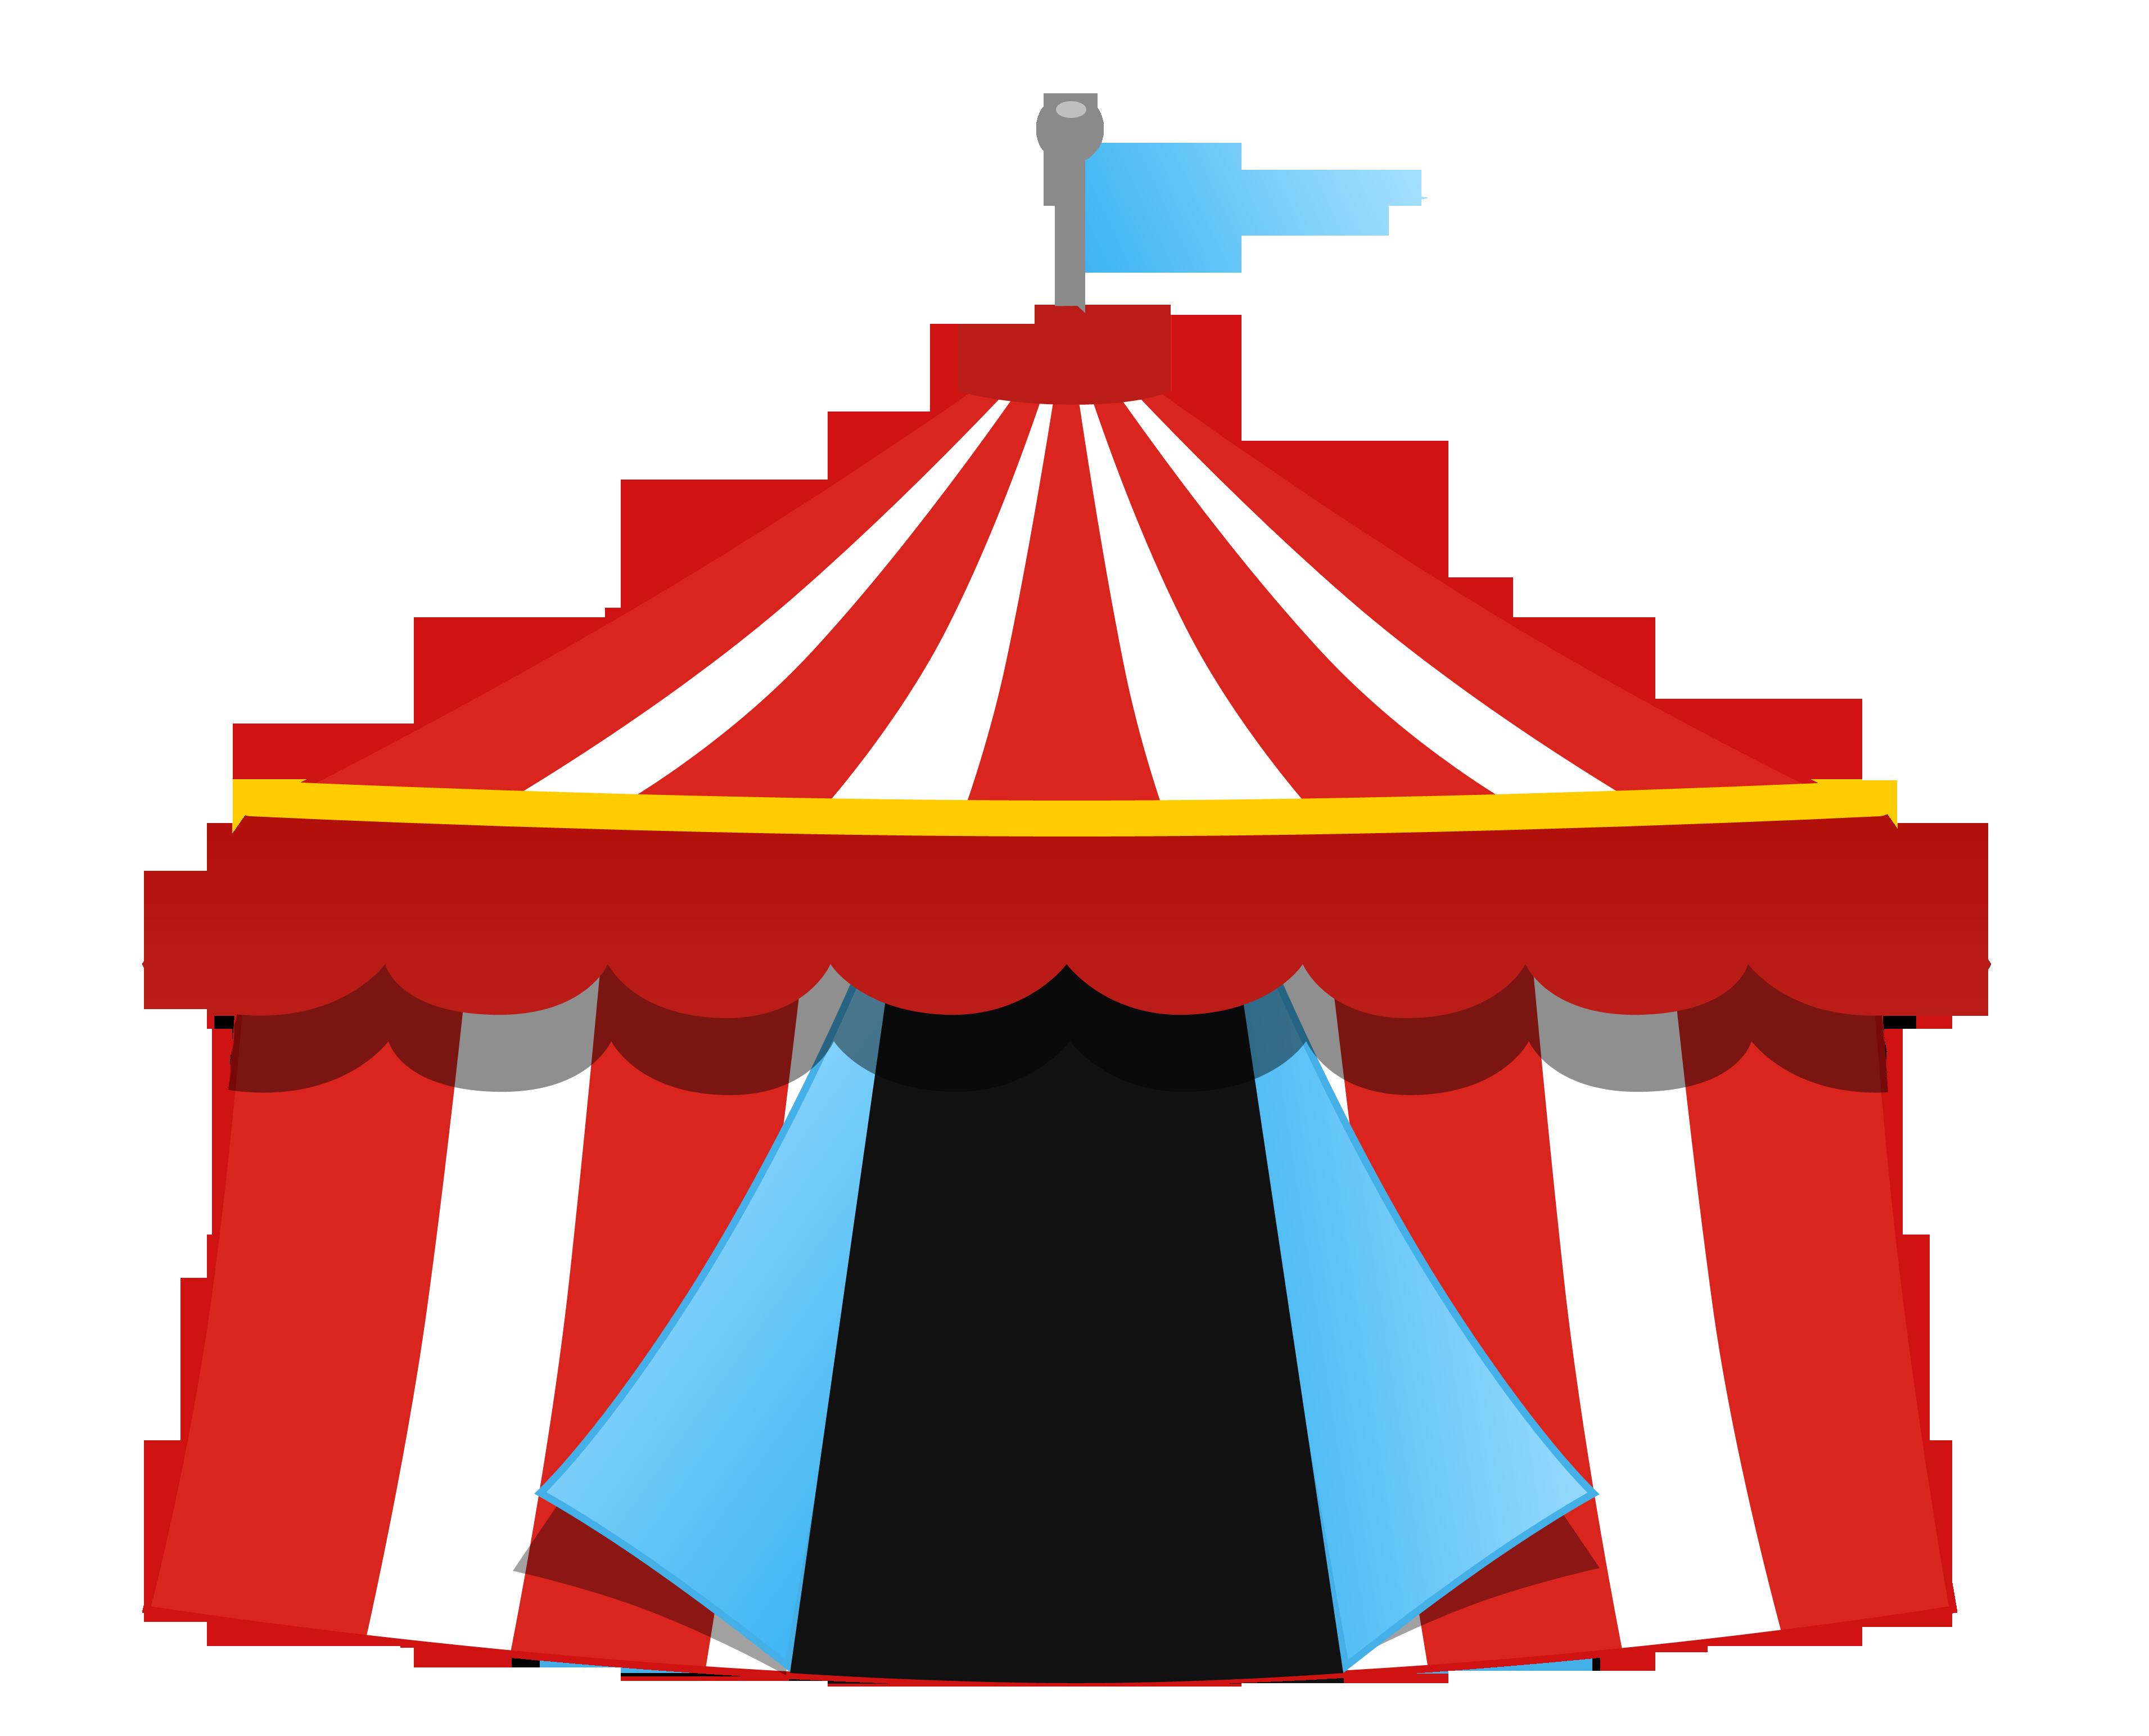 Circo lona tenda png. Circus clipart party tent